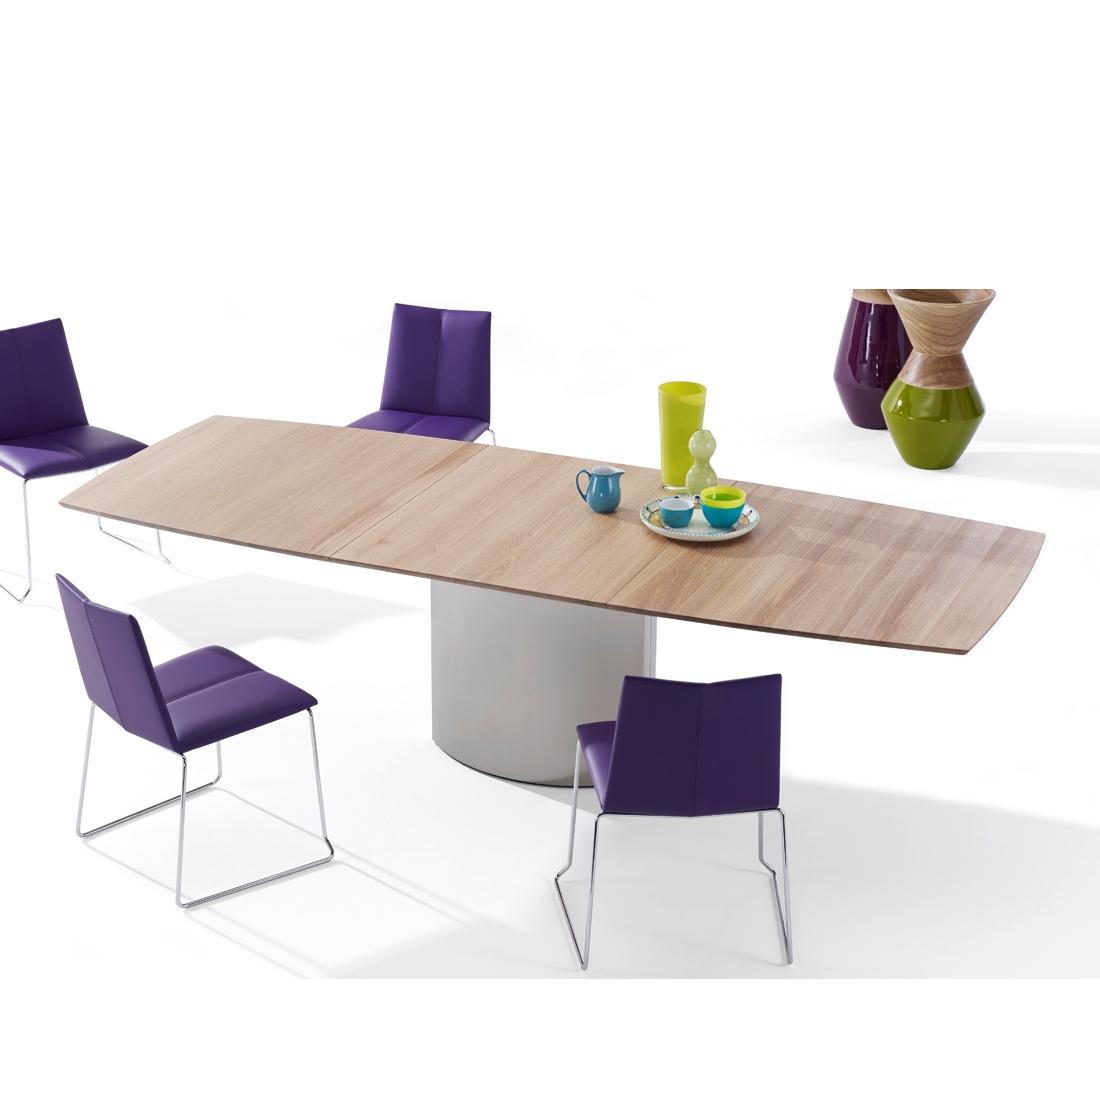 tisch 1224 adler ii von draenert. Black Bedroom Furniture Sets. Home Design Ideas